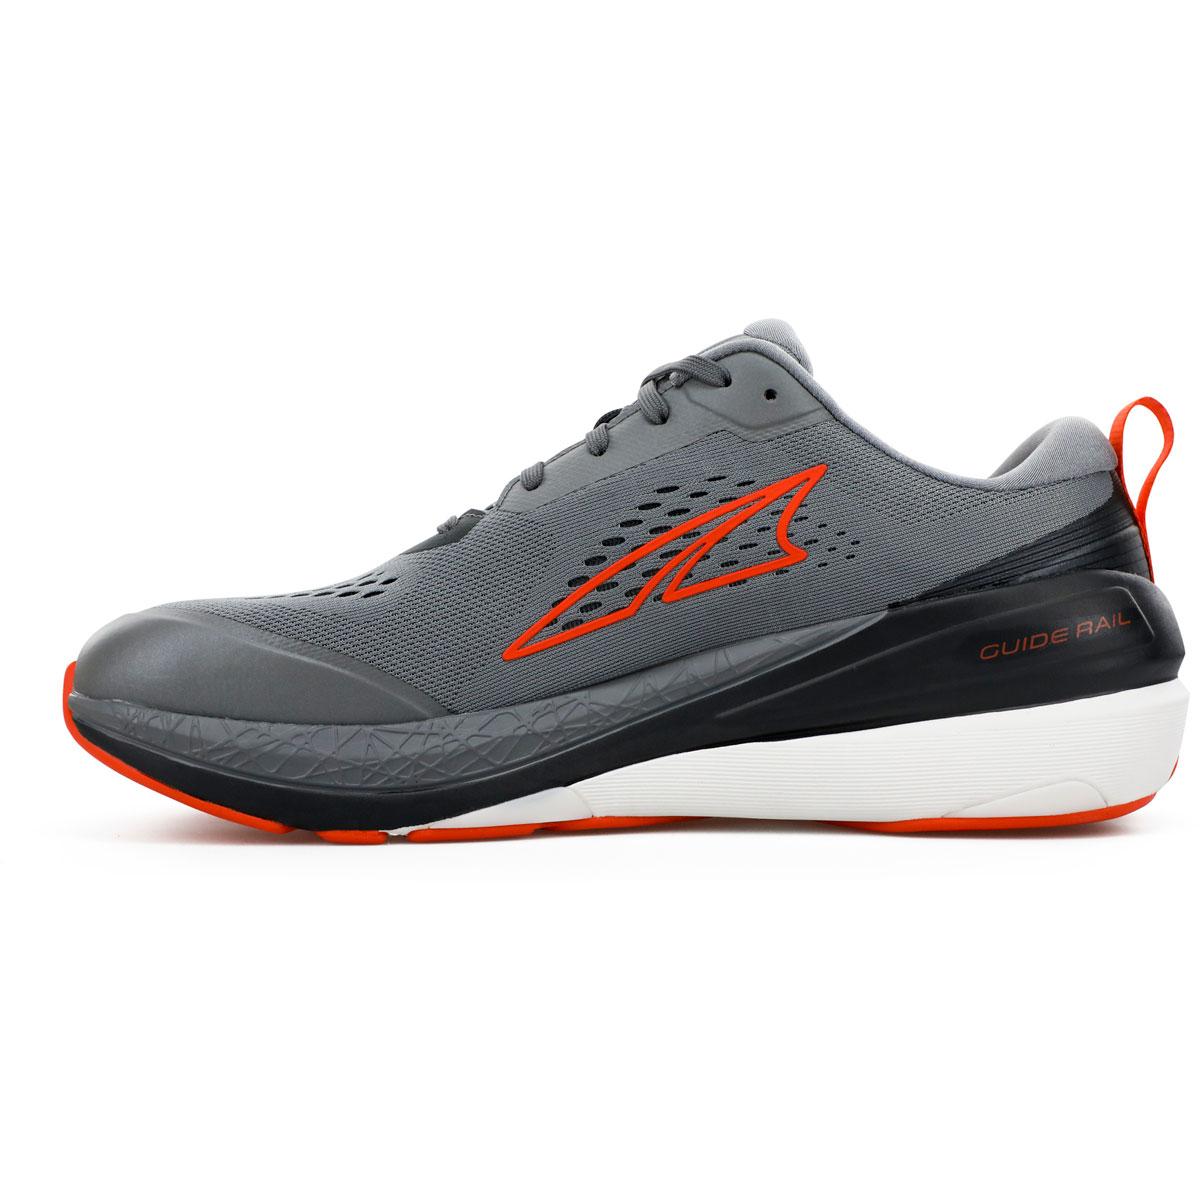 Men's Altra Paradigm 5 Running Shoe - Color: Gray/Orange - Size: 7 - Width: Regular, Gray/Orange, large, image 2